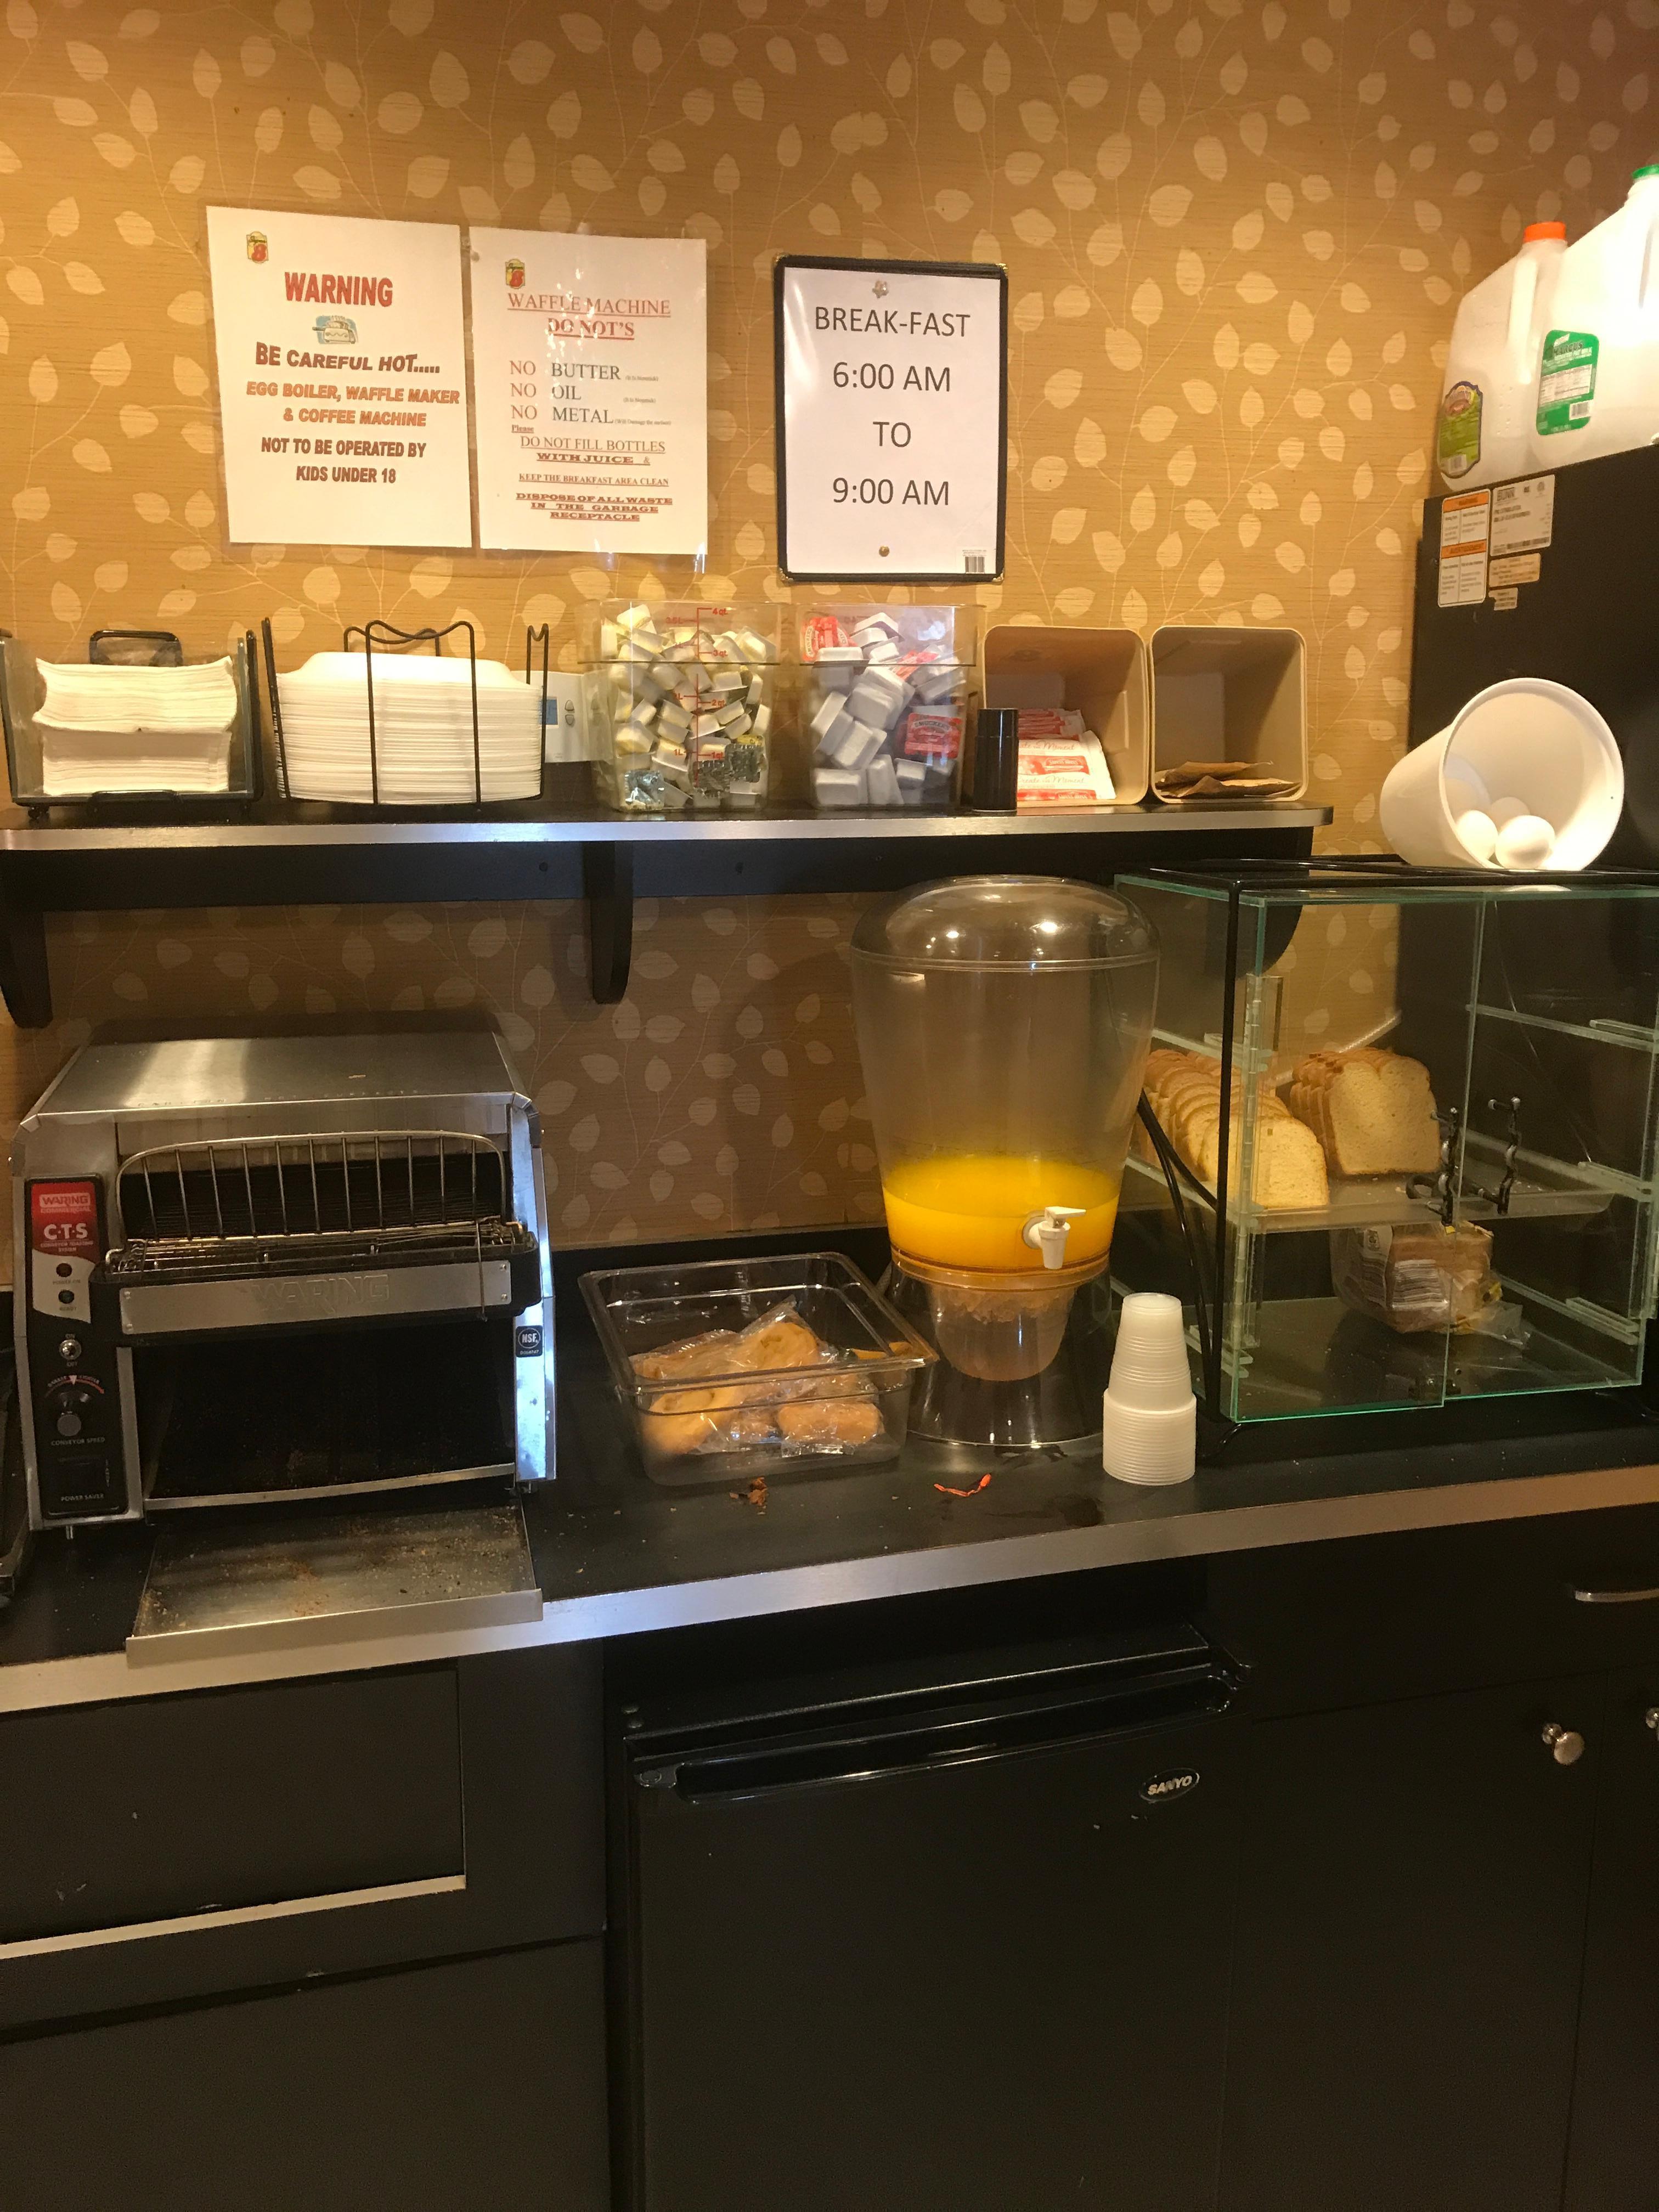 Frühstücksraum bzw Frühstückstankstelle